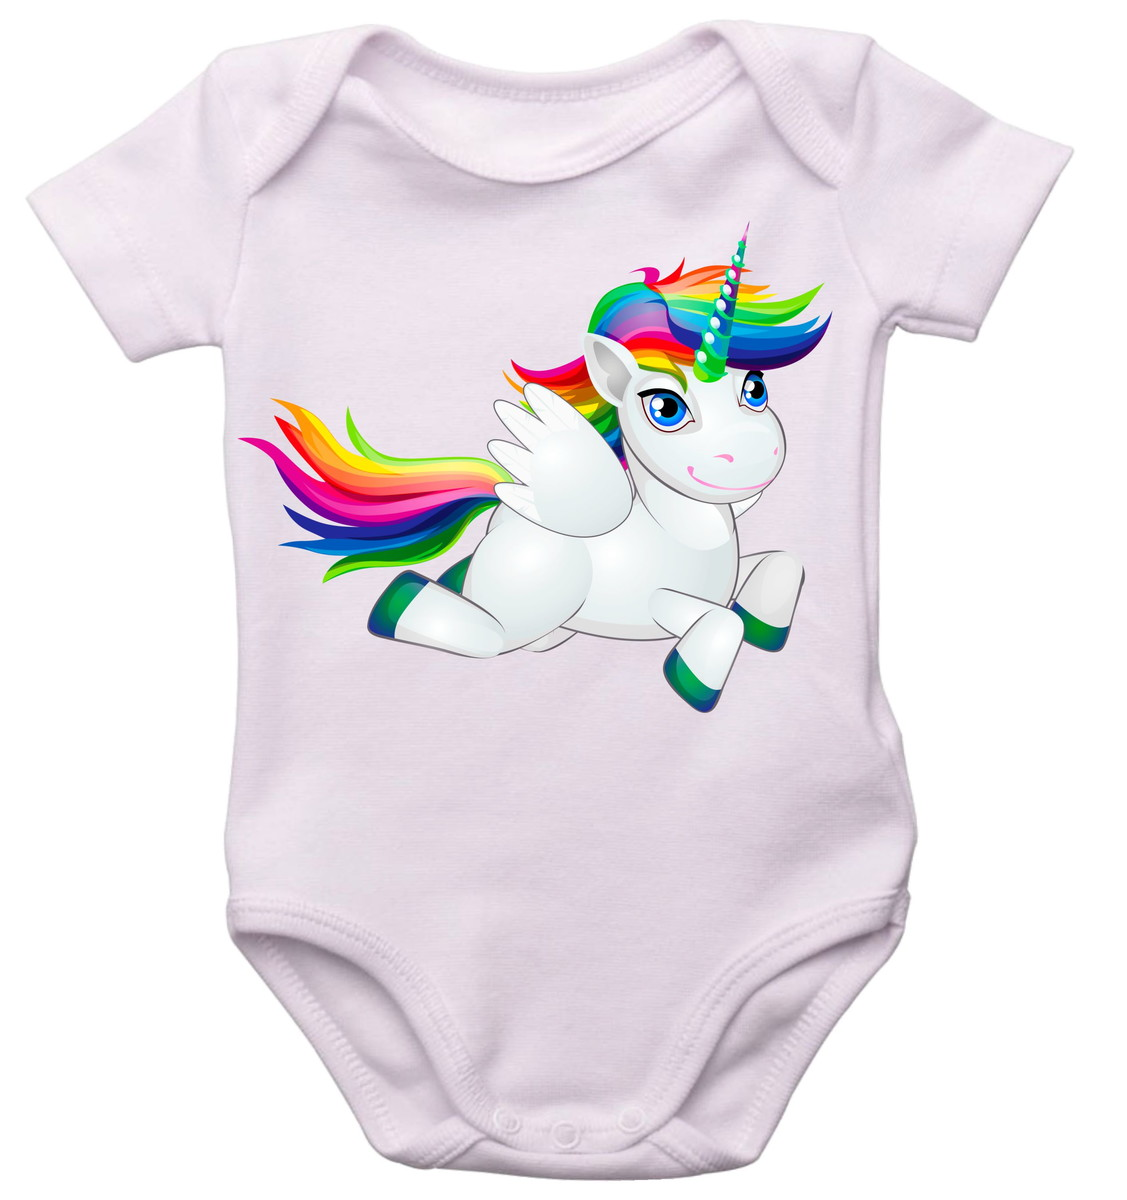 Body unicrnio lindo customizao bebs t Bebs 0a2bde0ece1